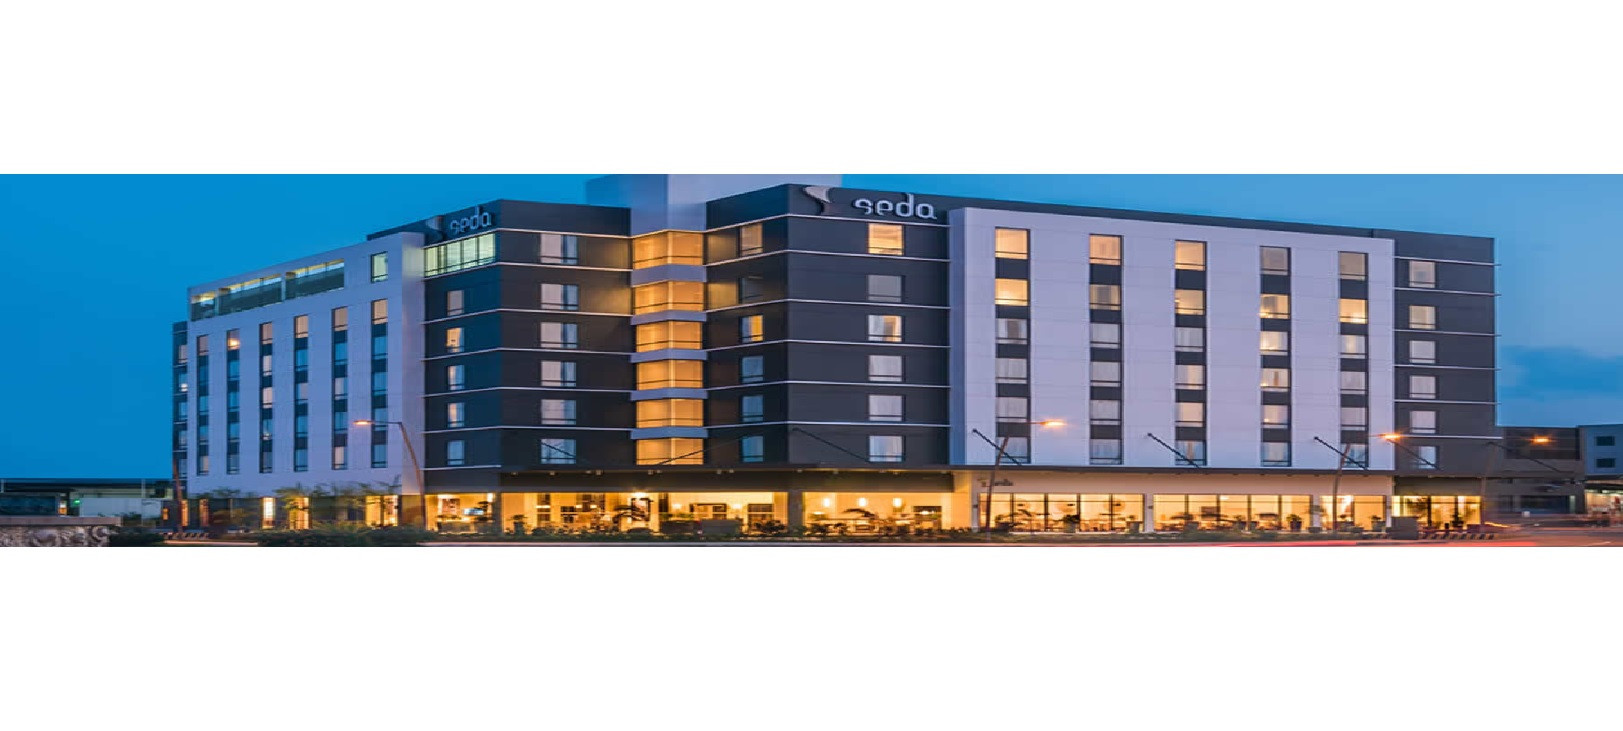 Seda Atria Hotel